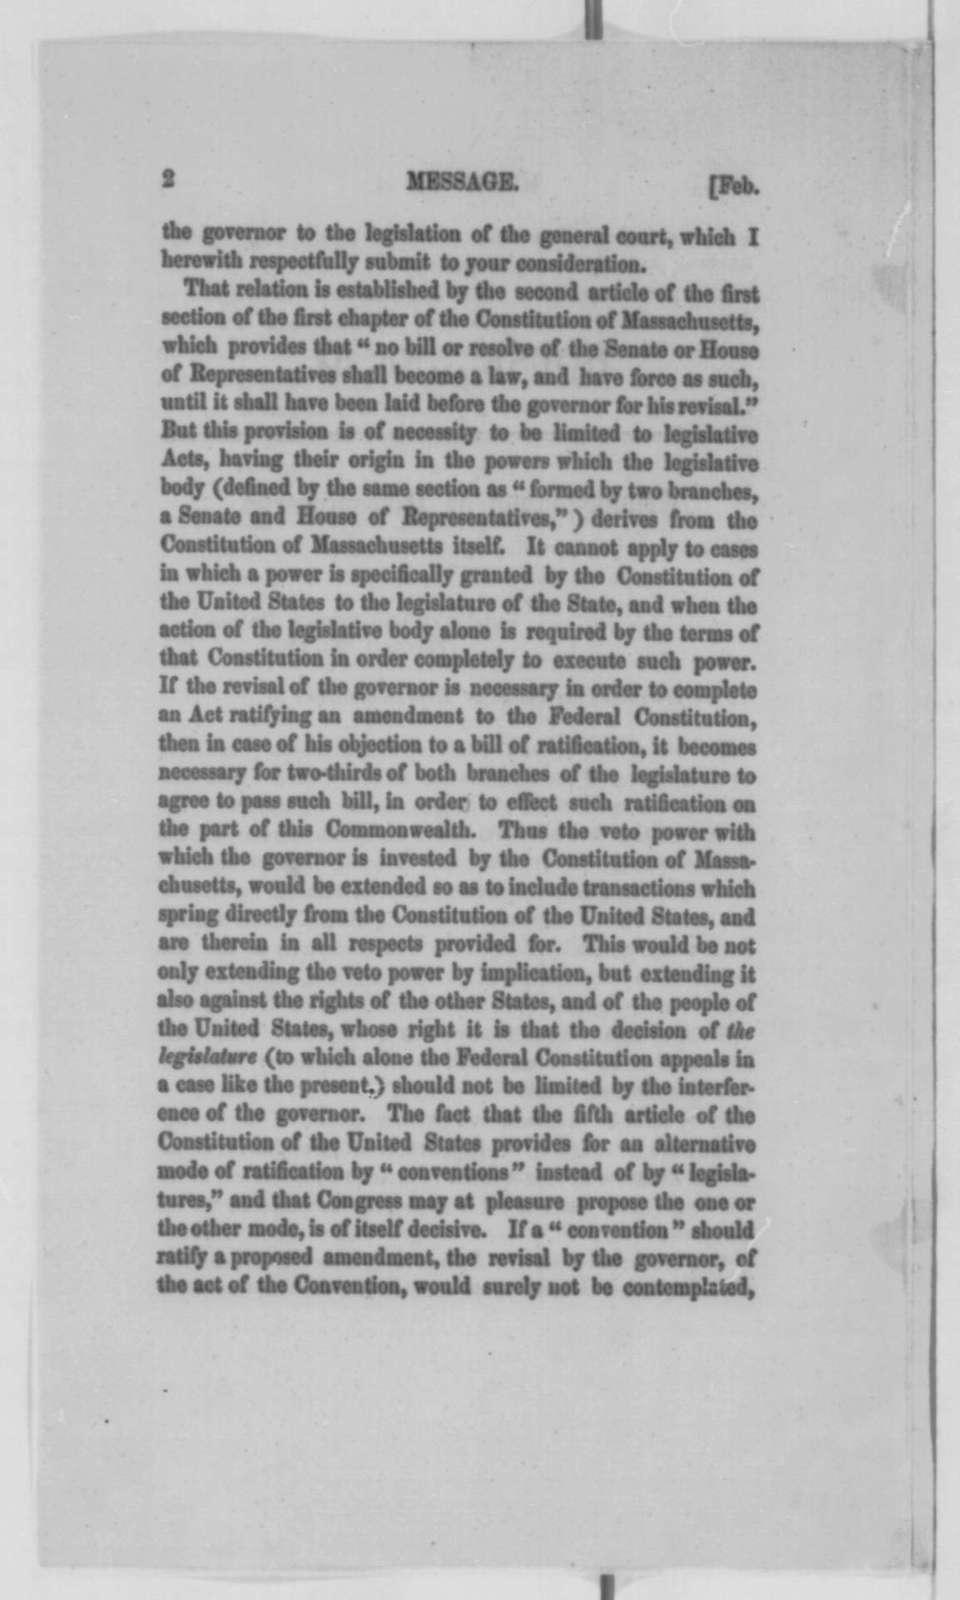 John A. Andrew to Massachusetts Legislature, Wednesday, February 08, 1865  (Printed message)